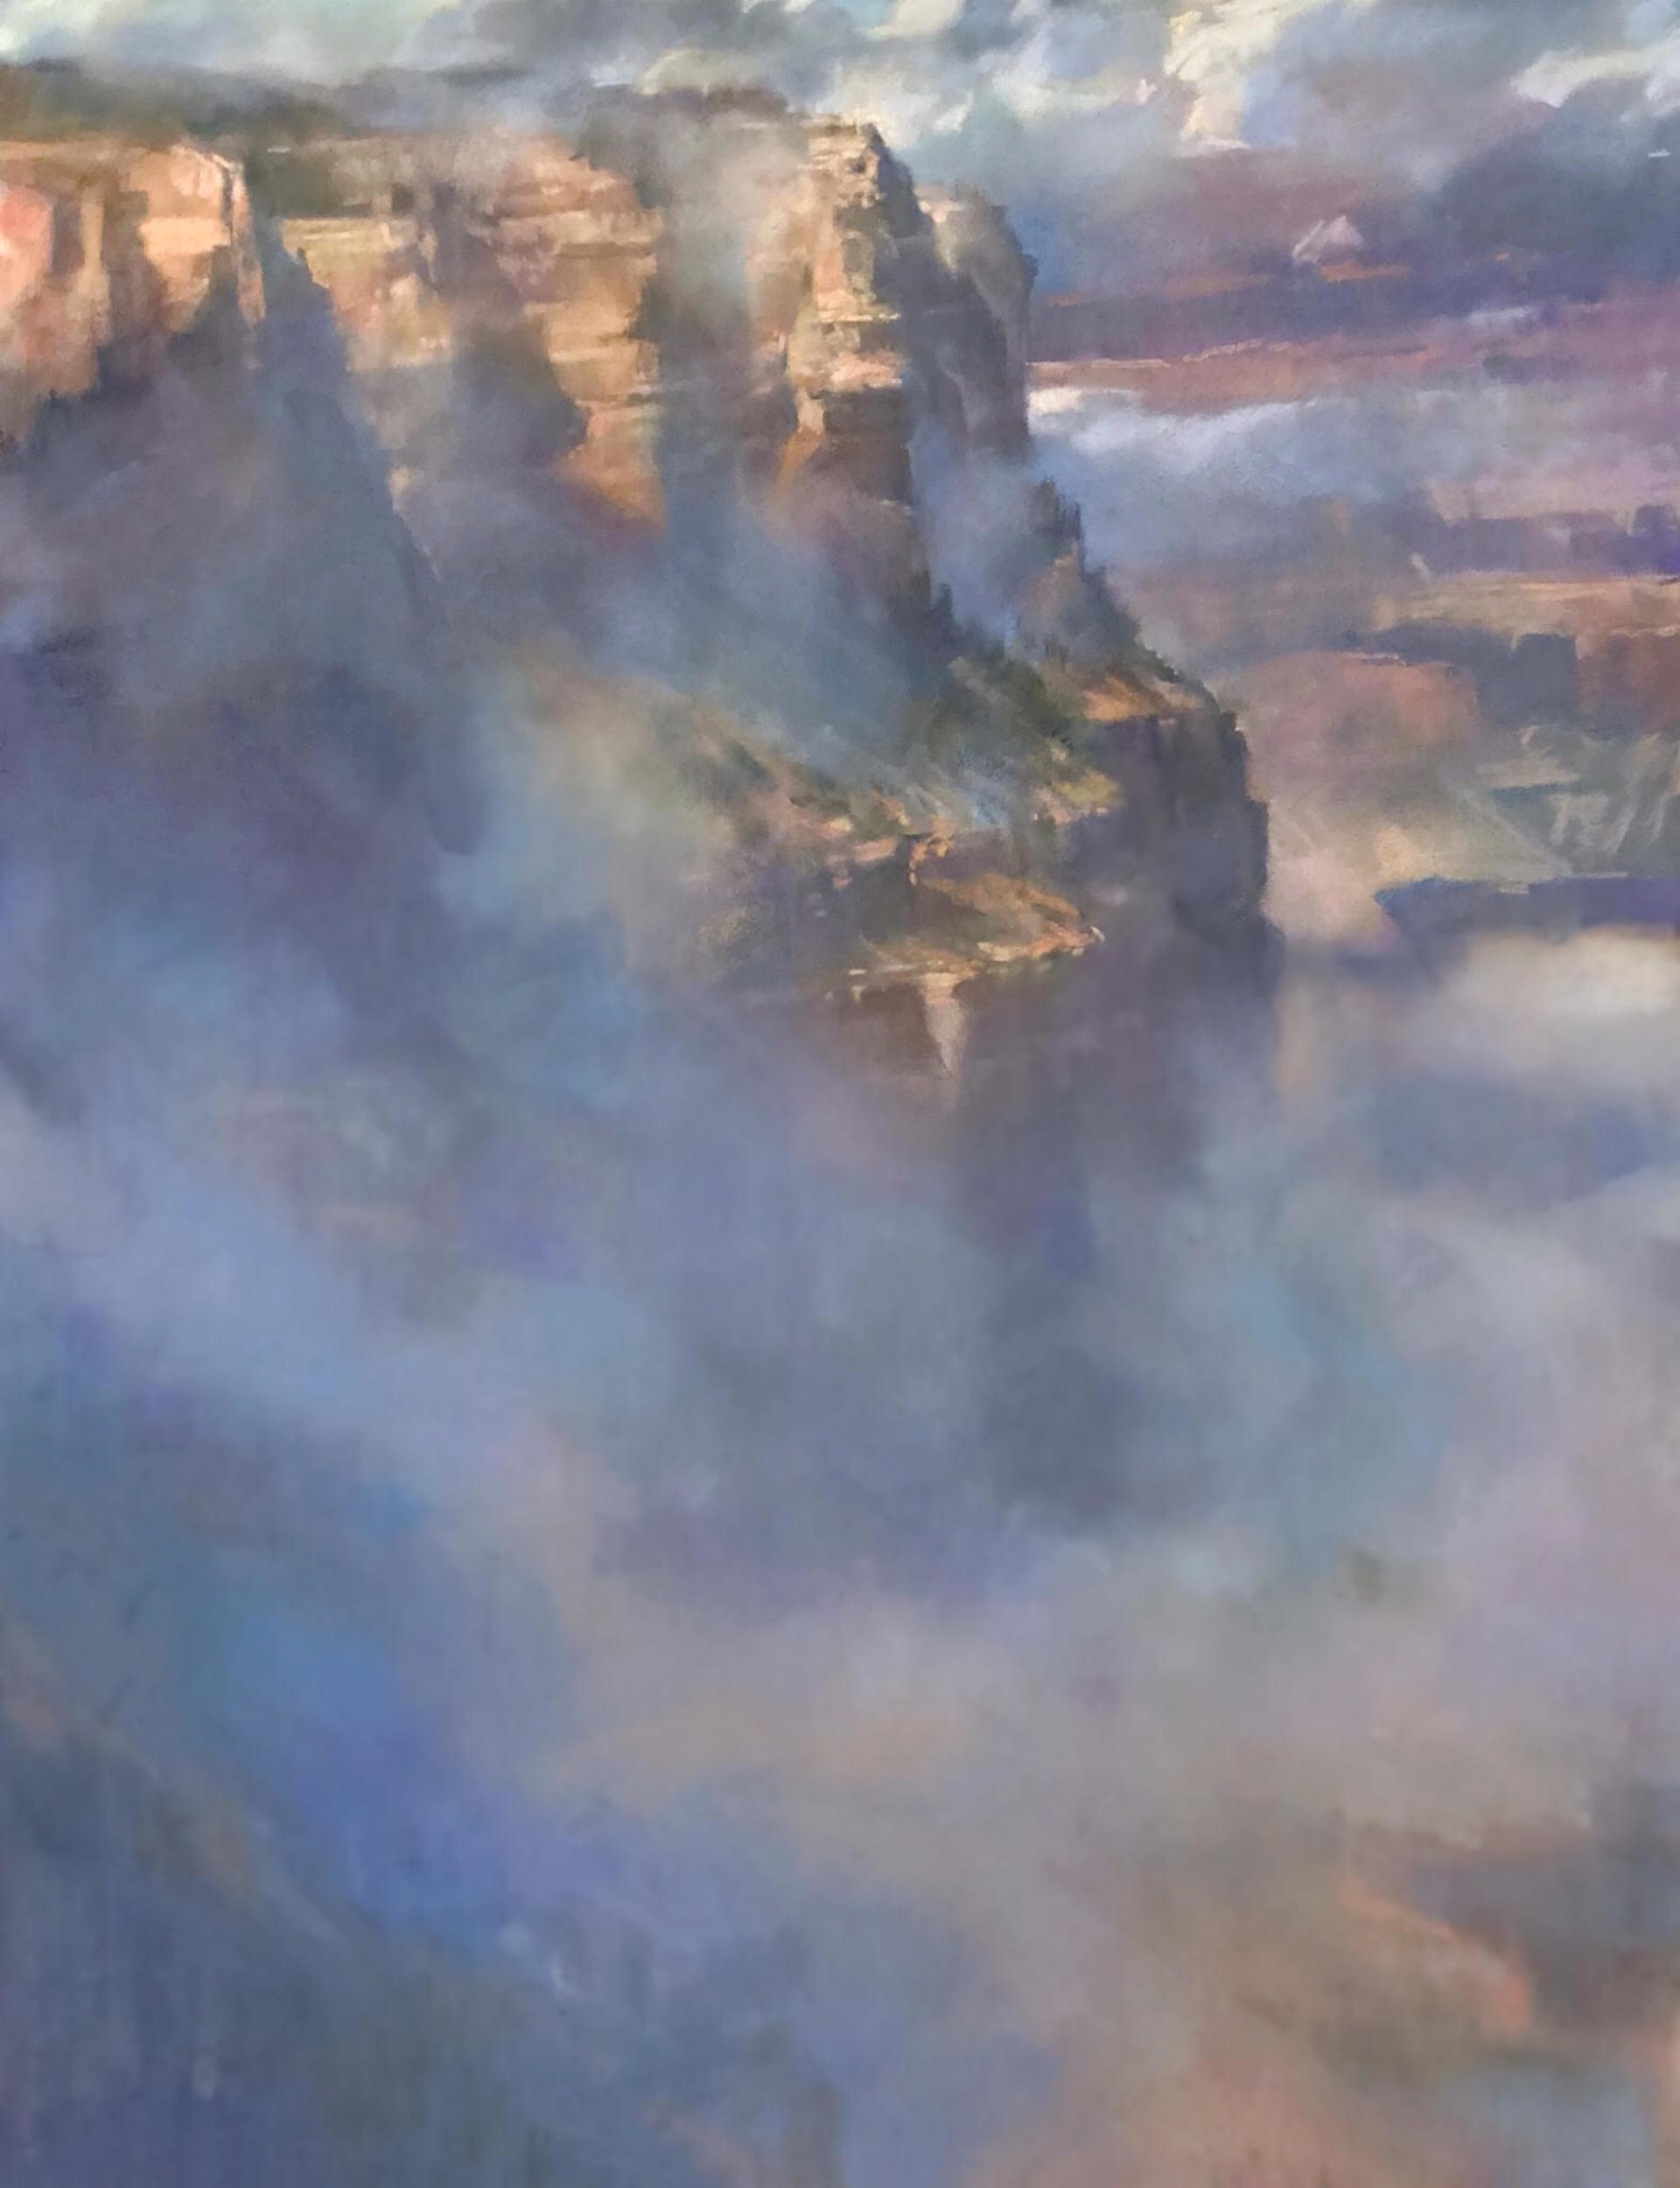 John, El Canyon y la Bruma by Bruce A Gómez